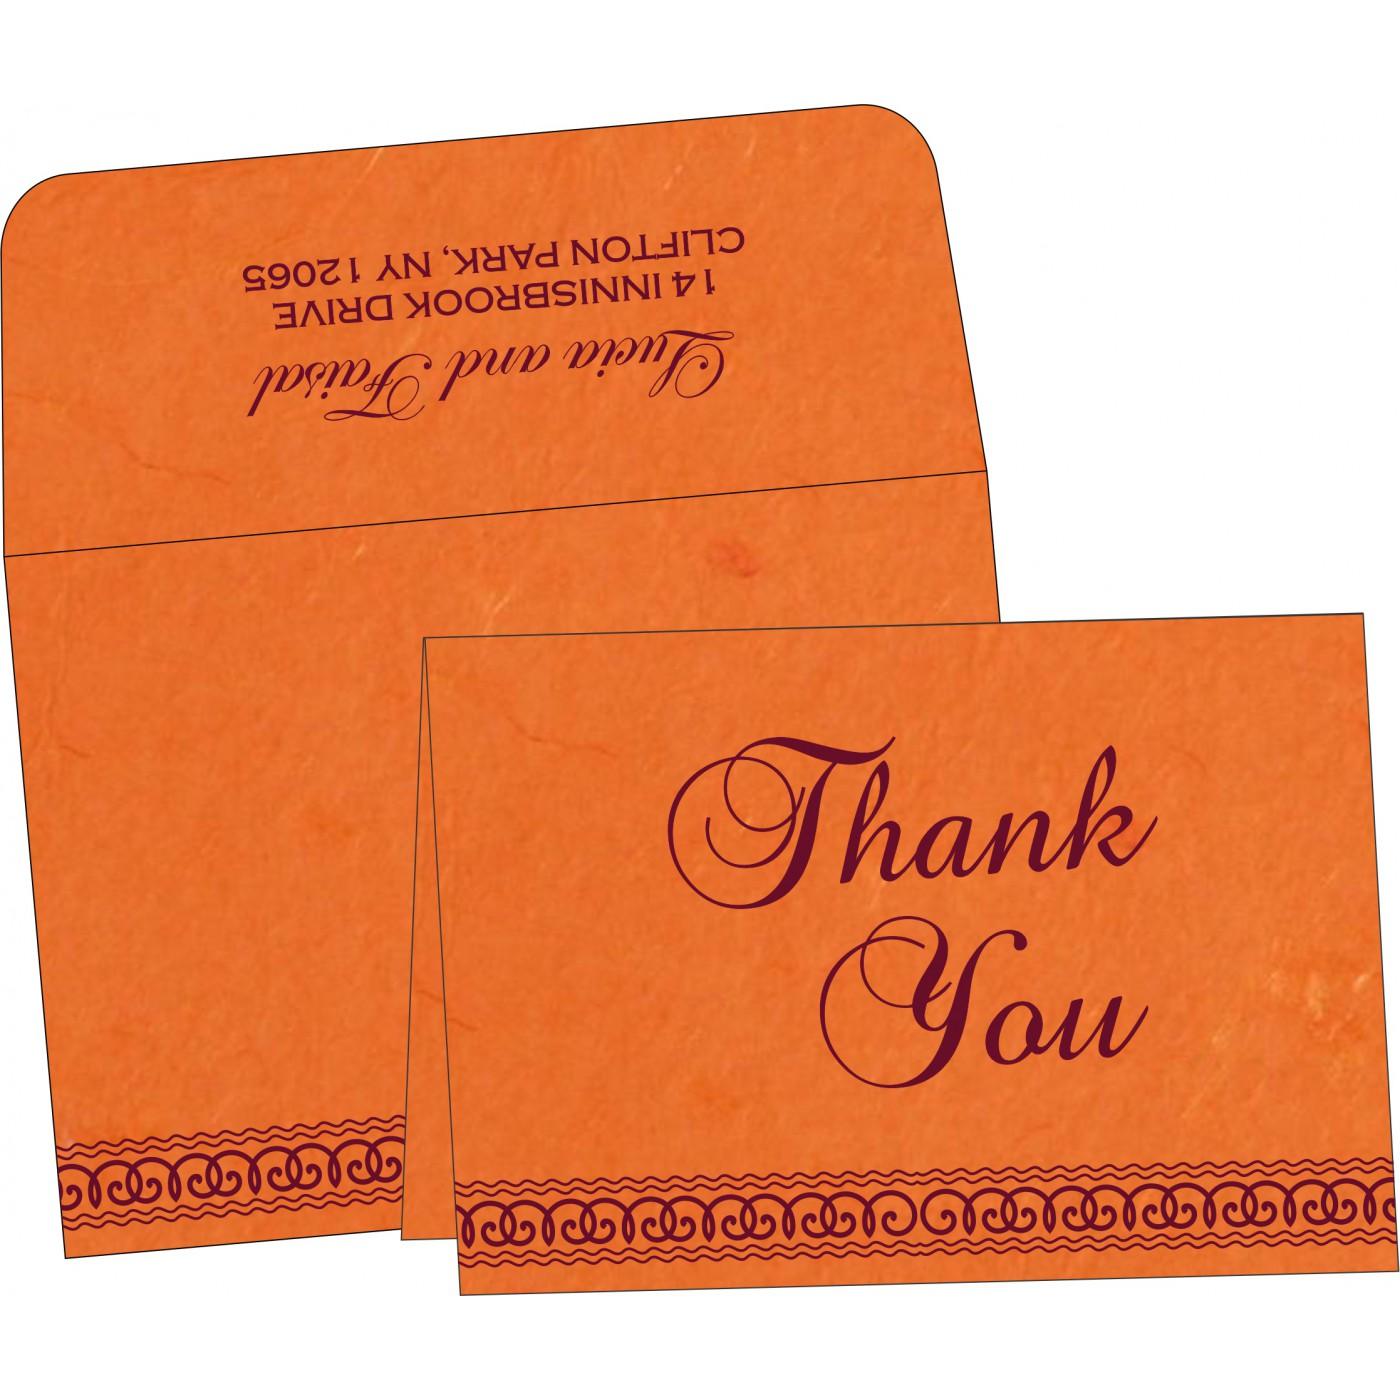 Thank You Cards : TYC-5002A - 123WeddingCards